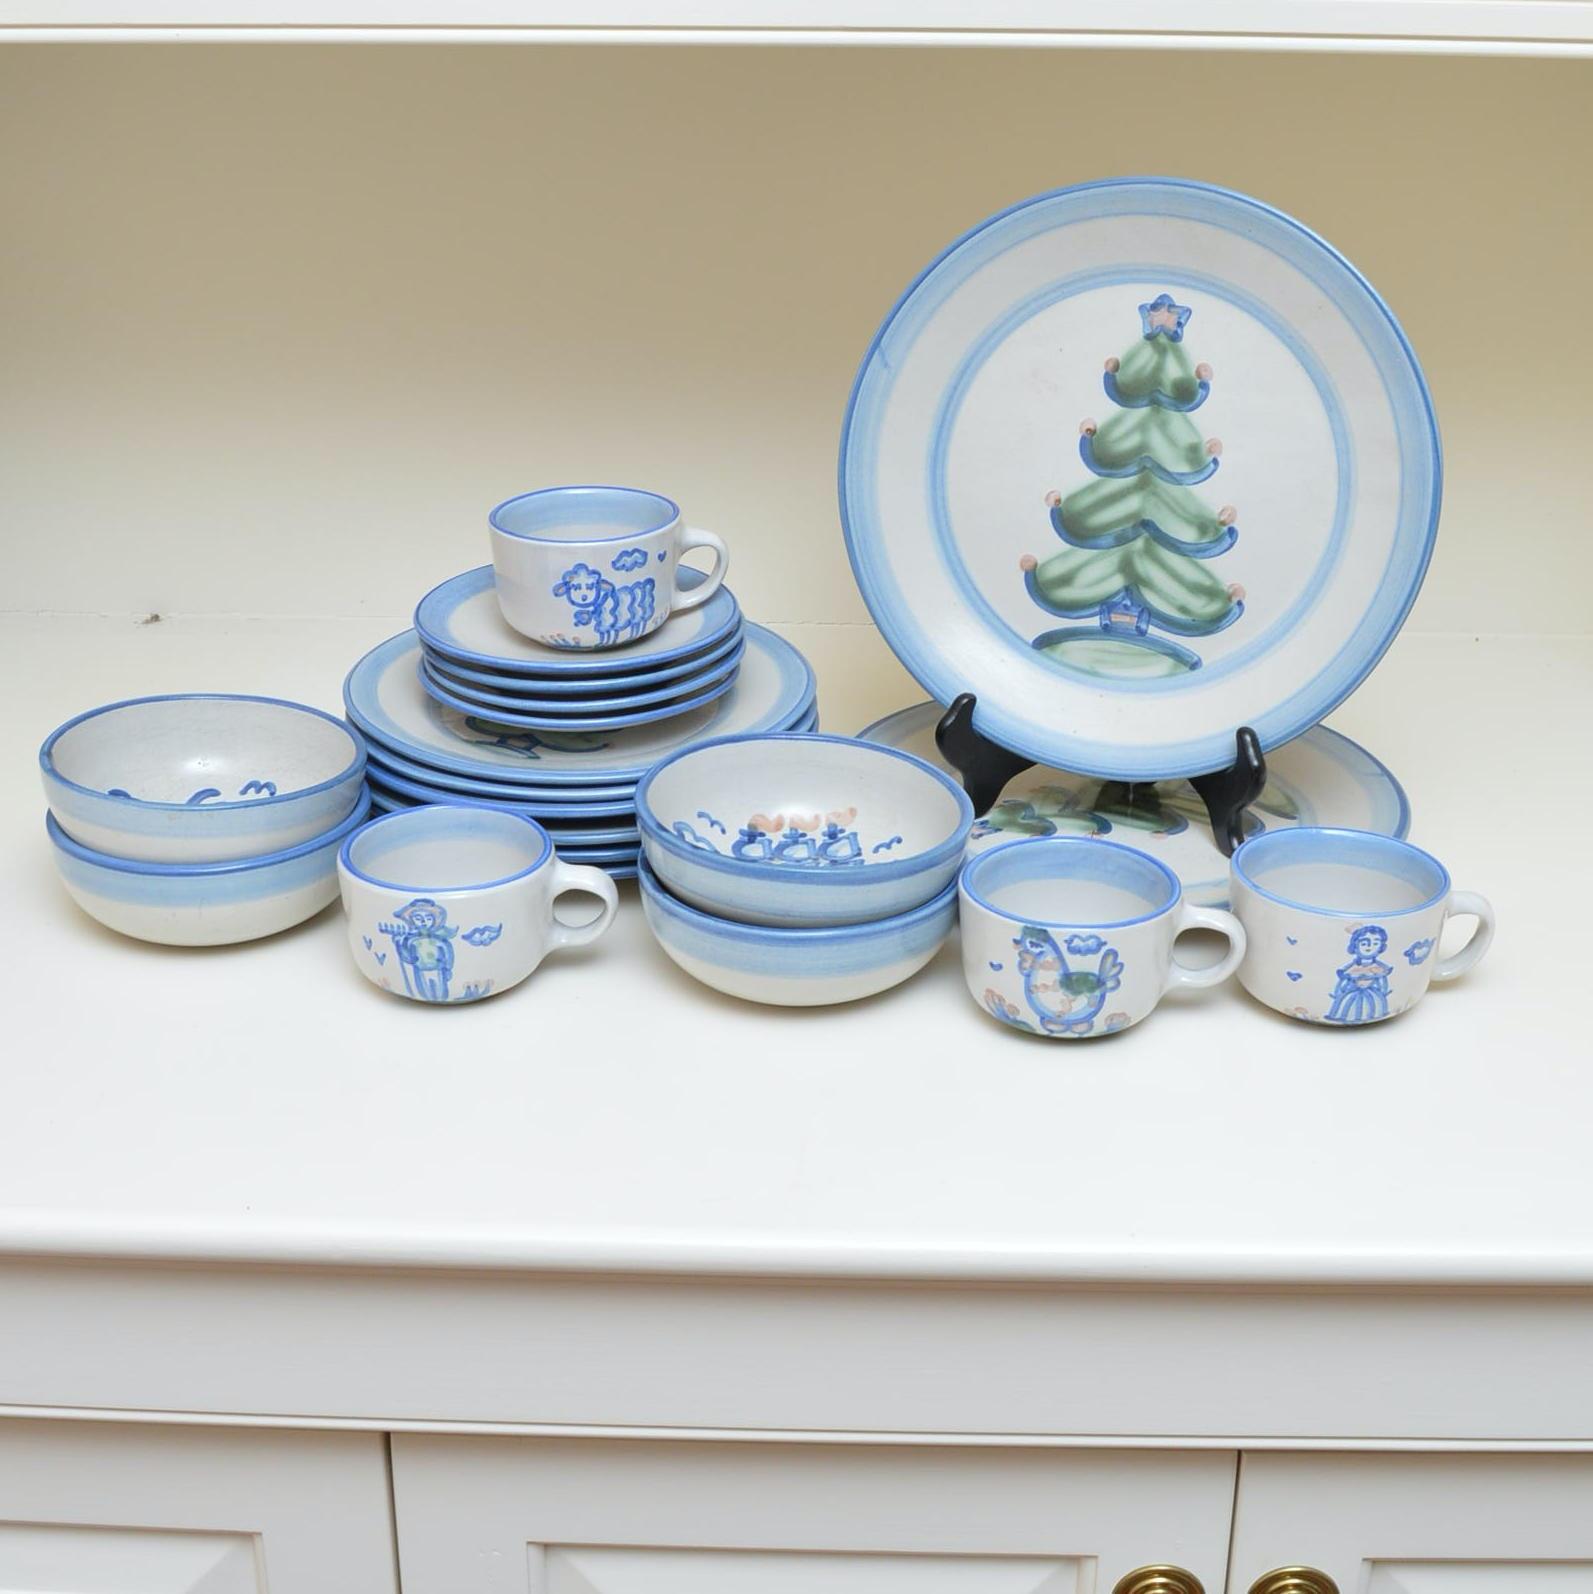 M.A. Hadley Pottery Tableware